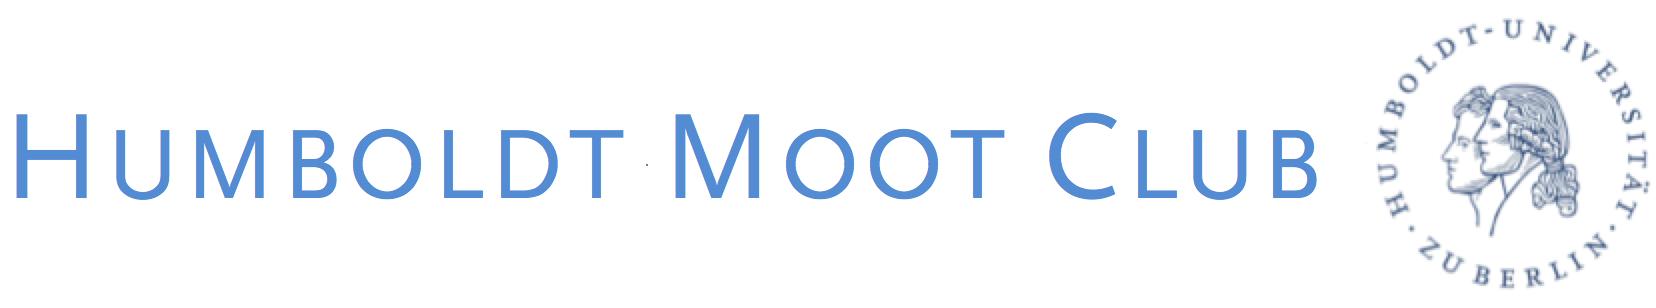 Humboldt Moot Club e. V.